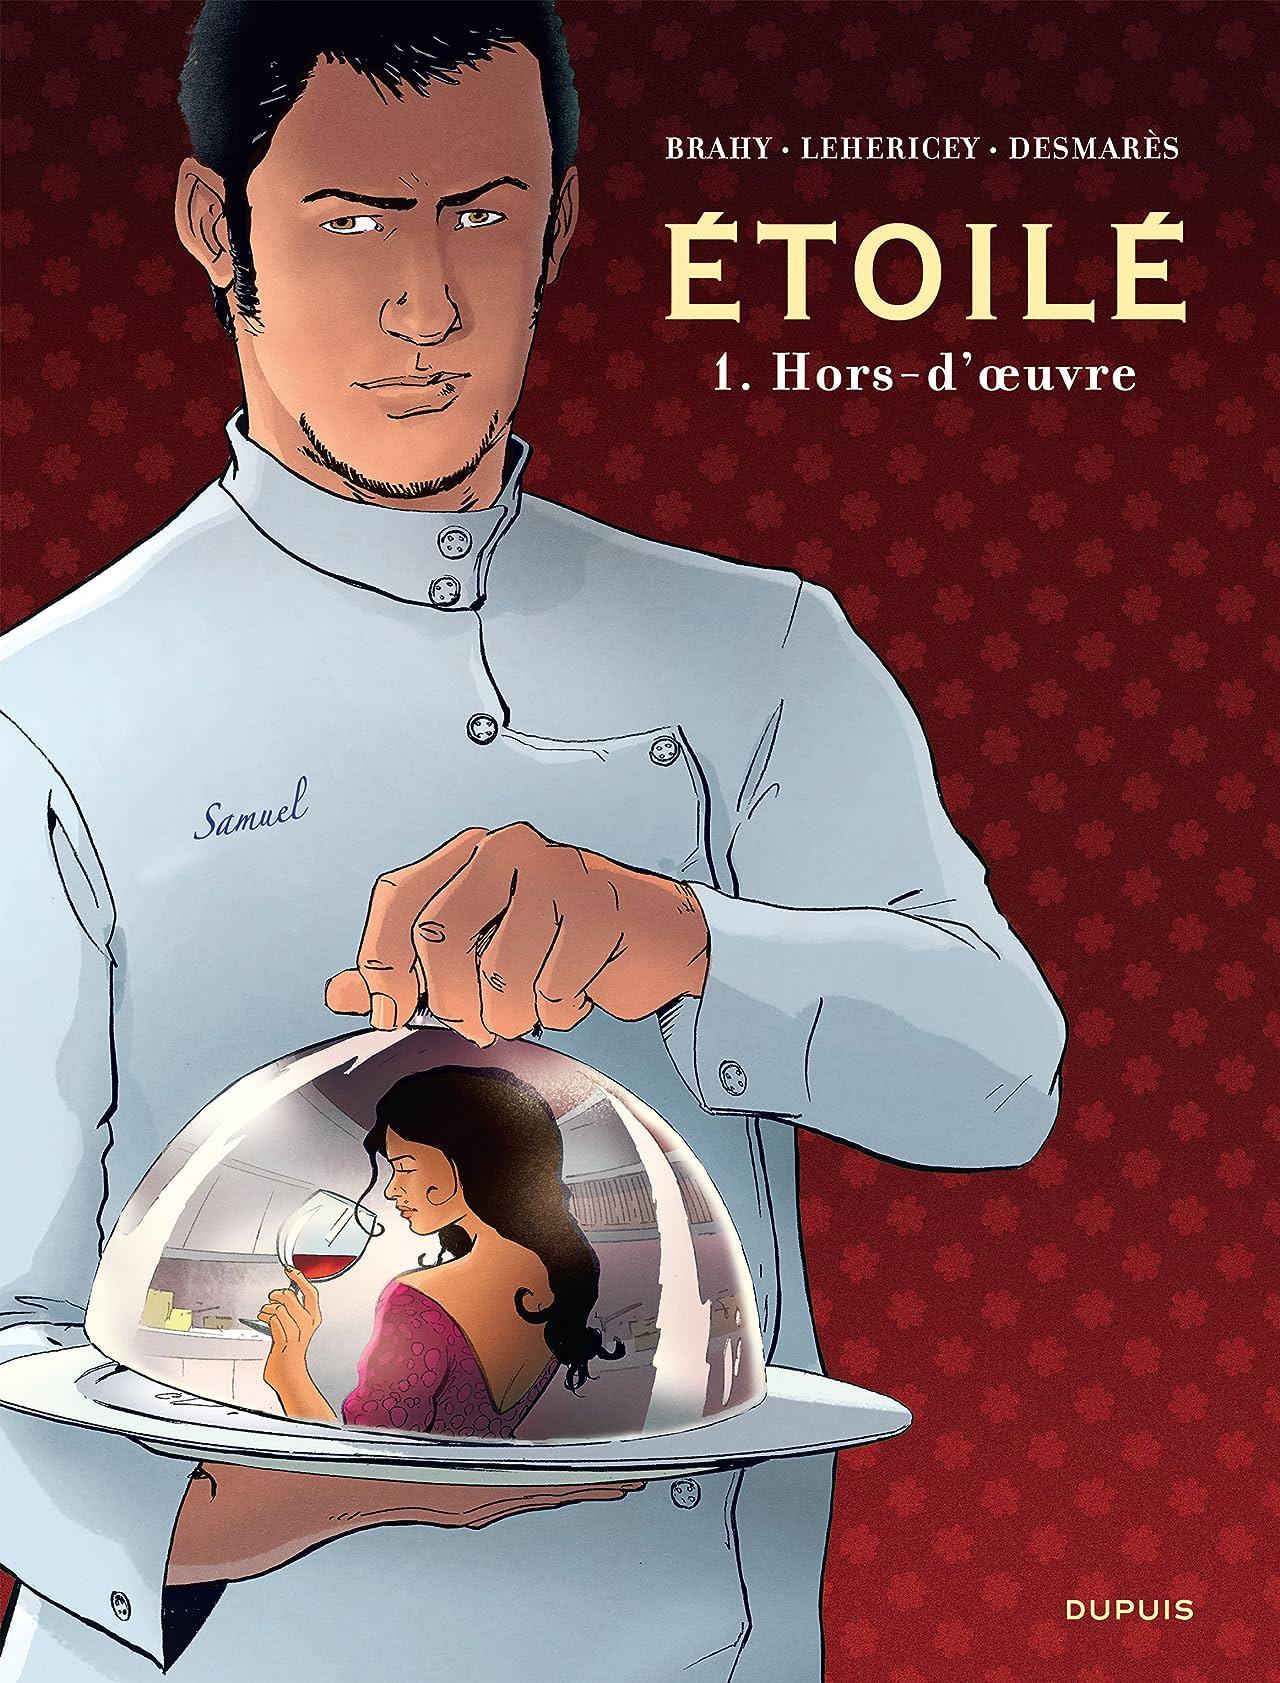 Etoilé Vol. 1: Hors-d'oeuvre